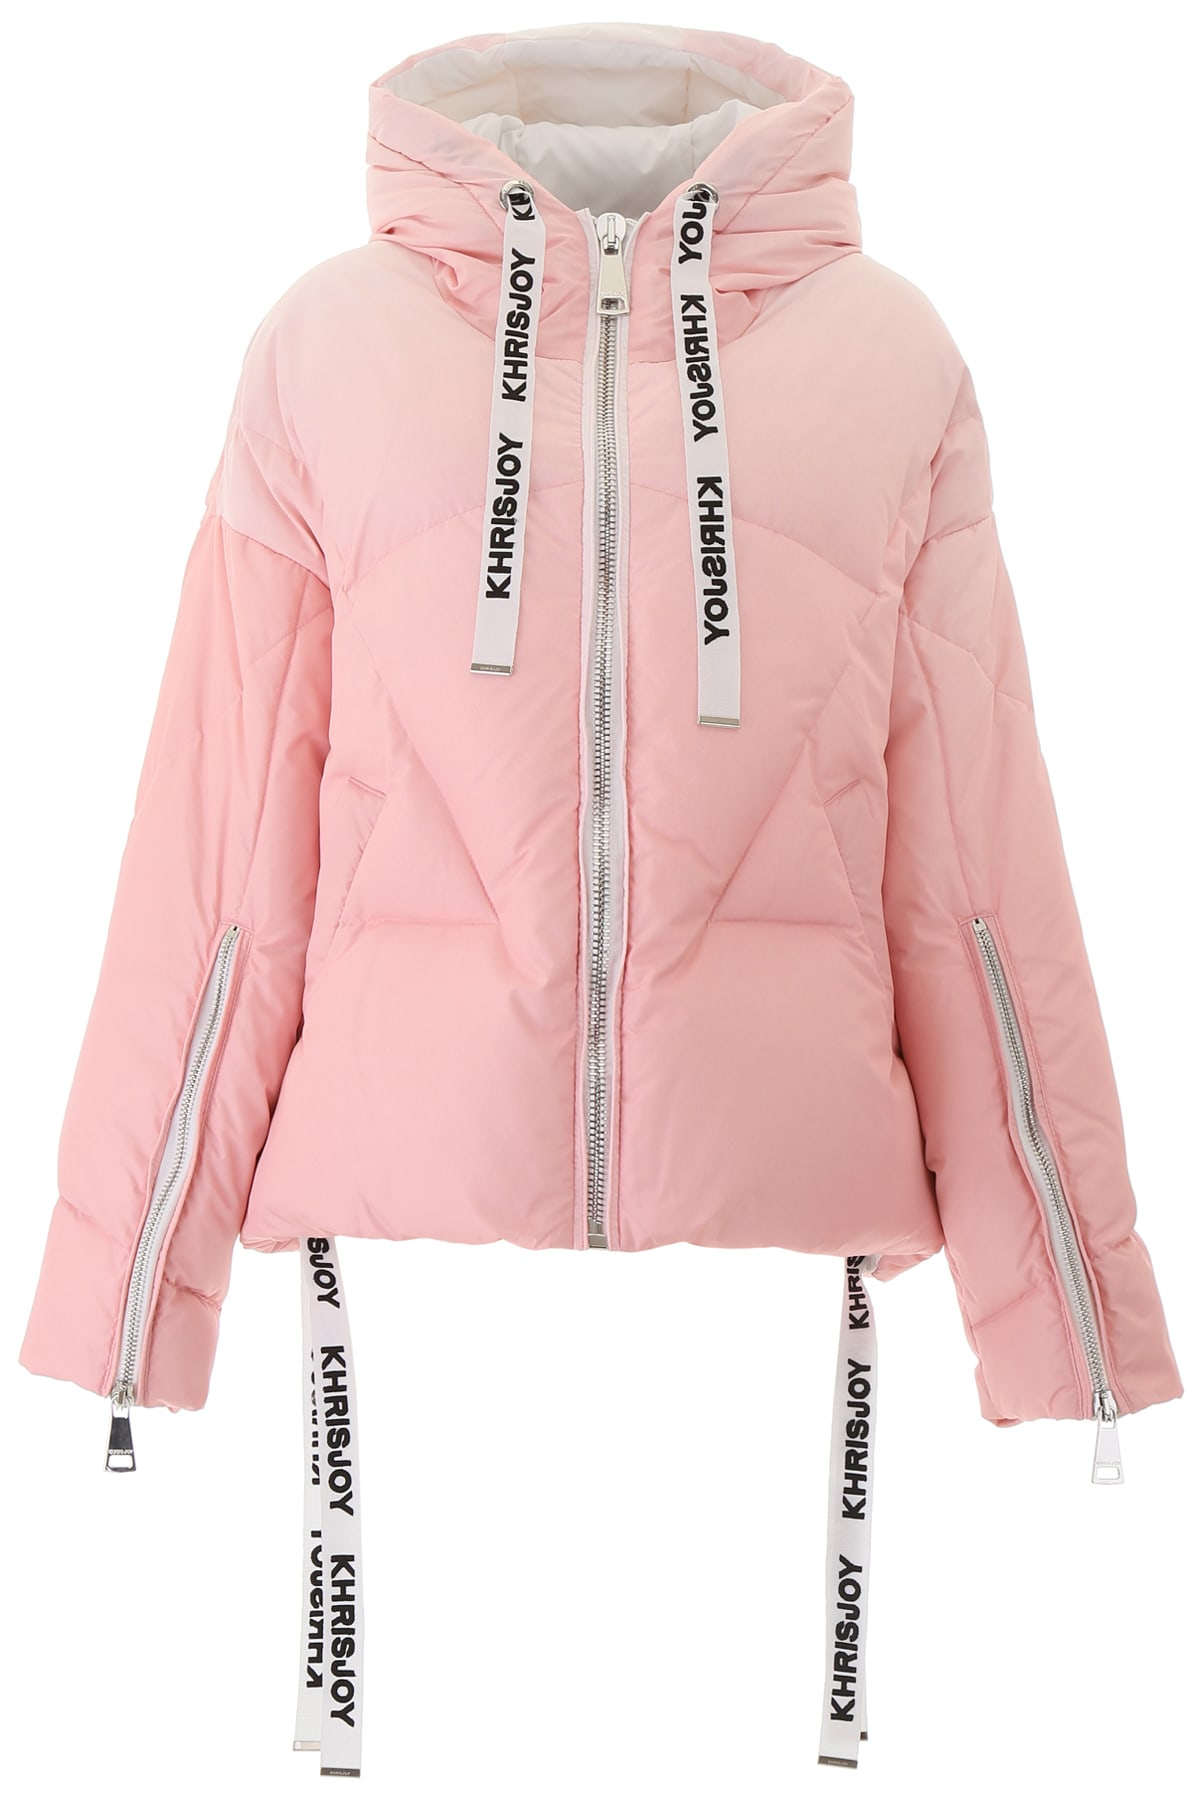 Khrisjoy Ombre Khris Puffer Jacket